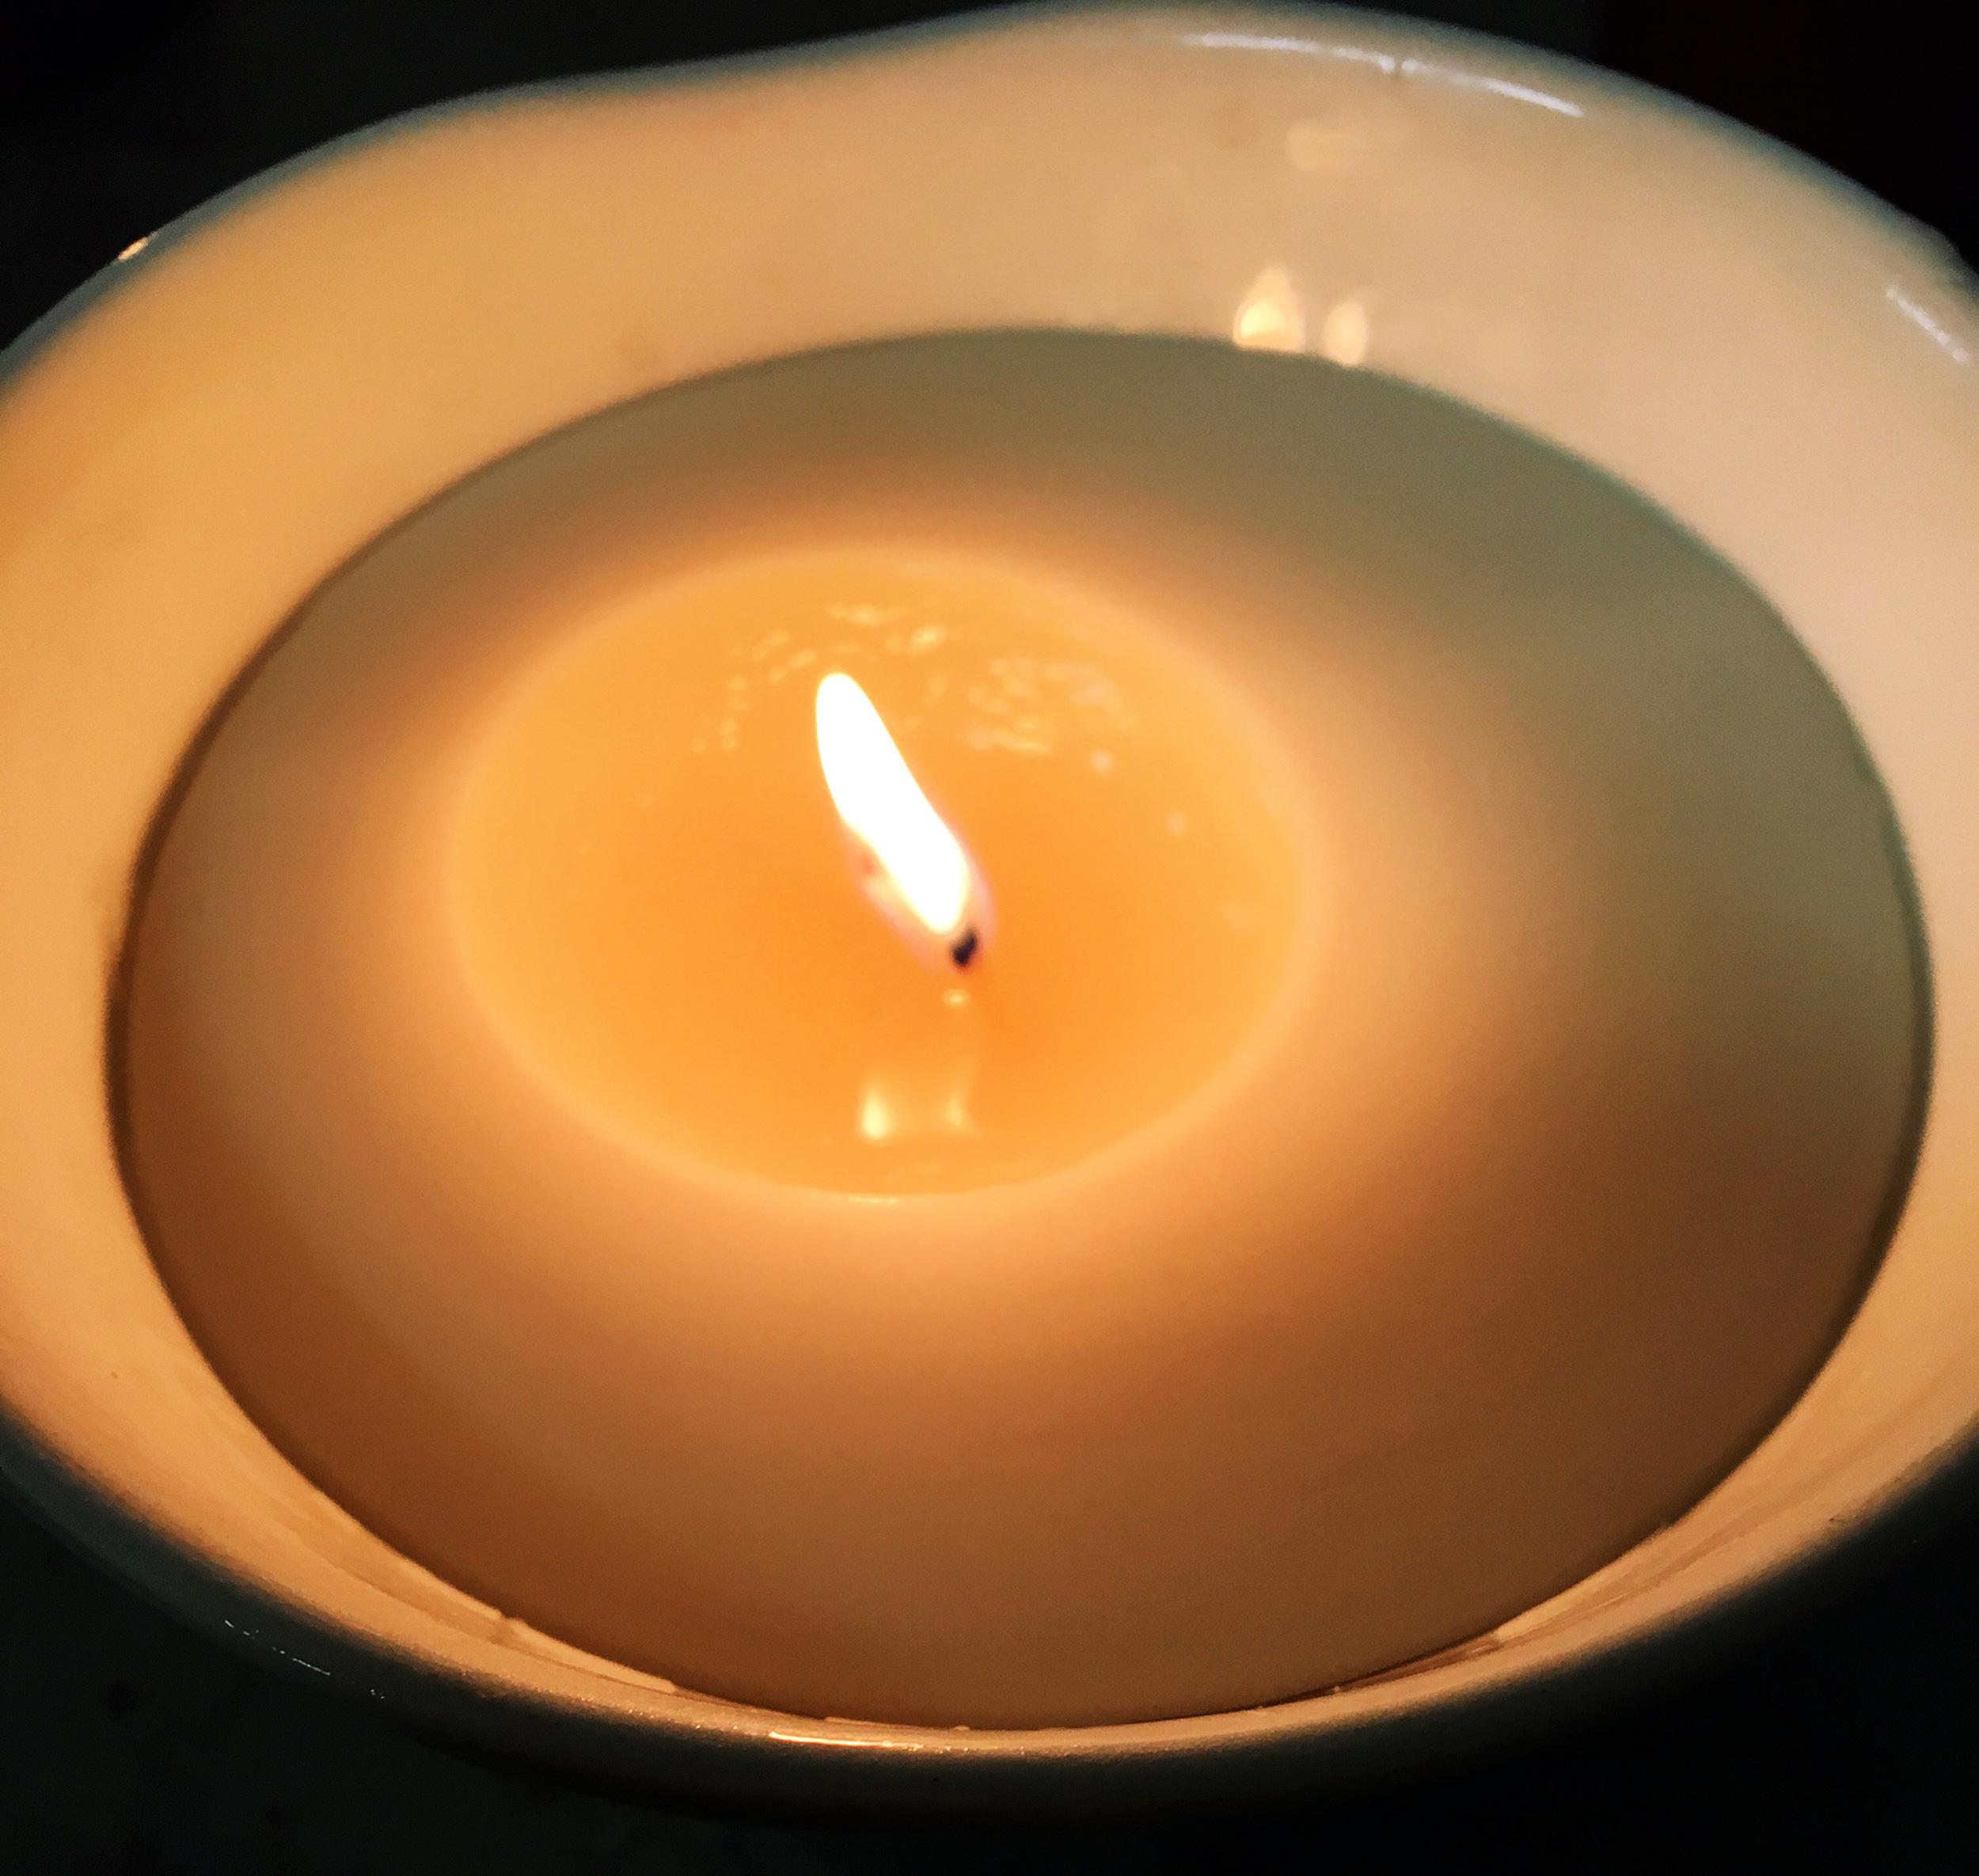 kapula-handmade-soy-candles-ceramic-bowl-burning.jpg